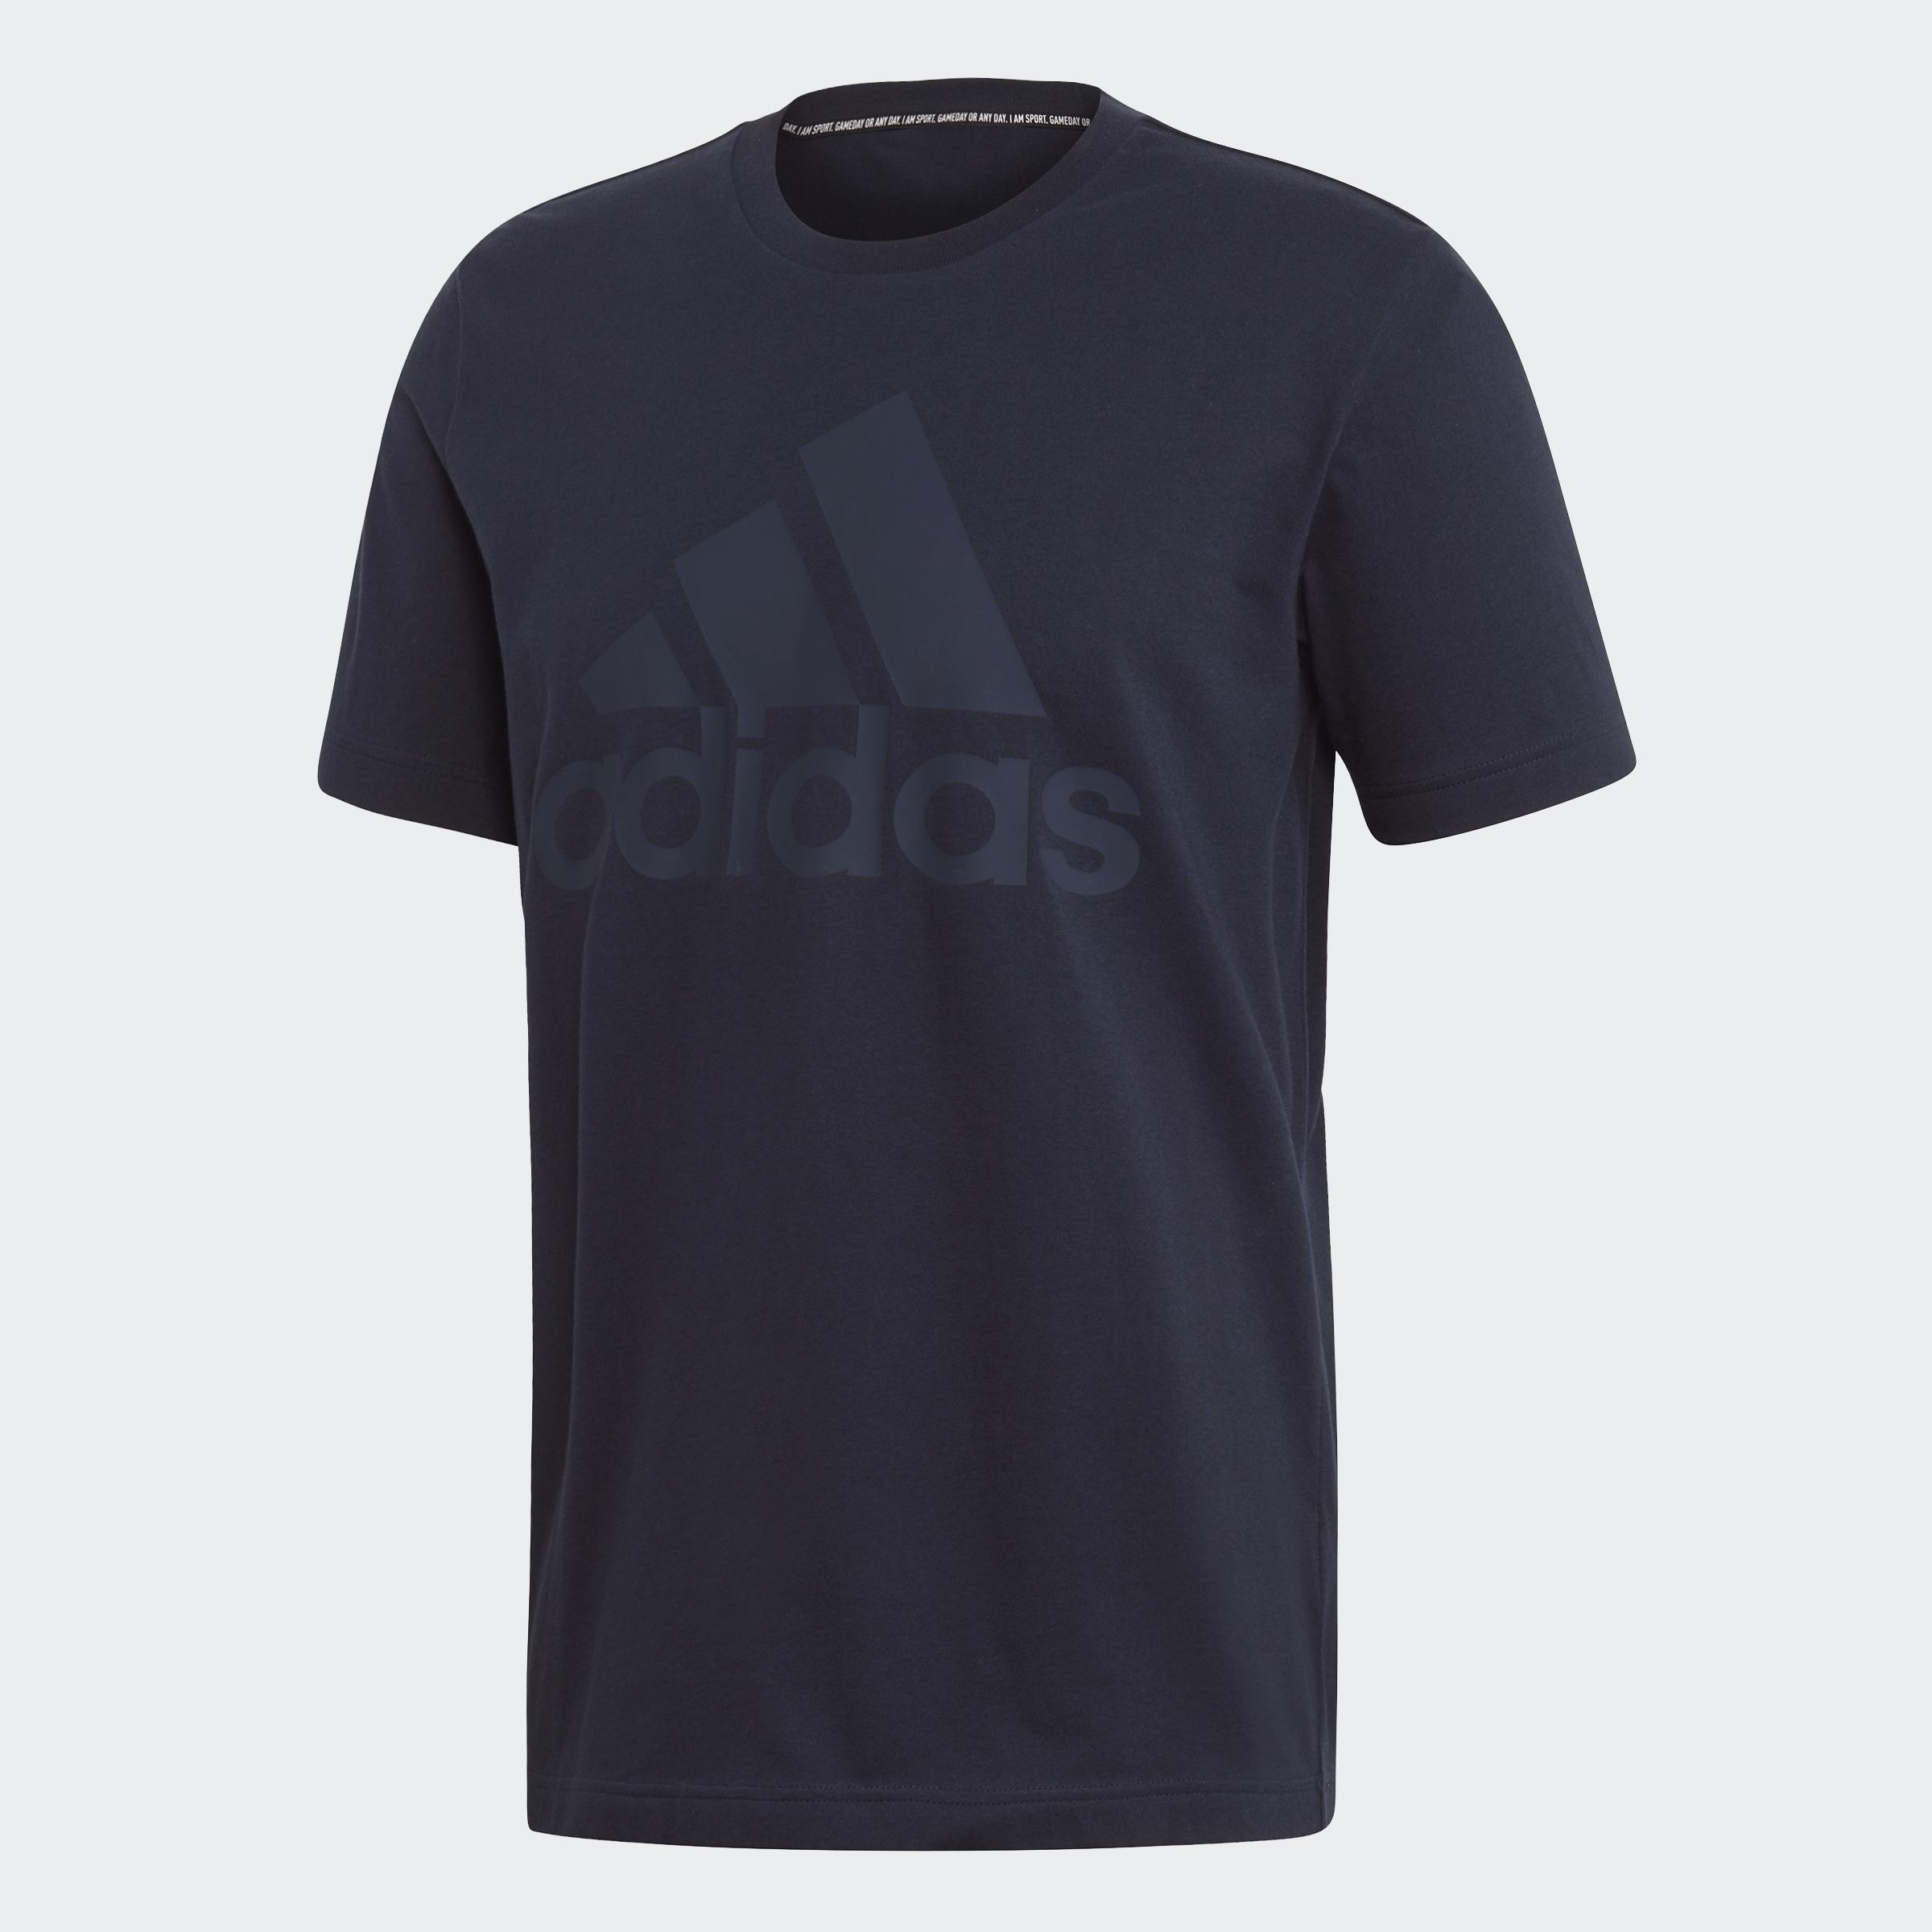 adidas-Must-Haves-Badge-of-Sport-Tee-Men-039-s-Shirts thumbnail 17